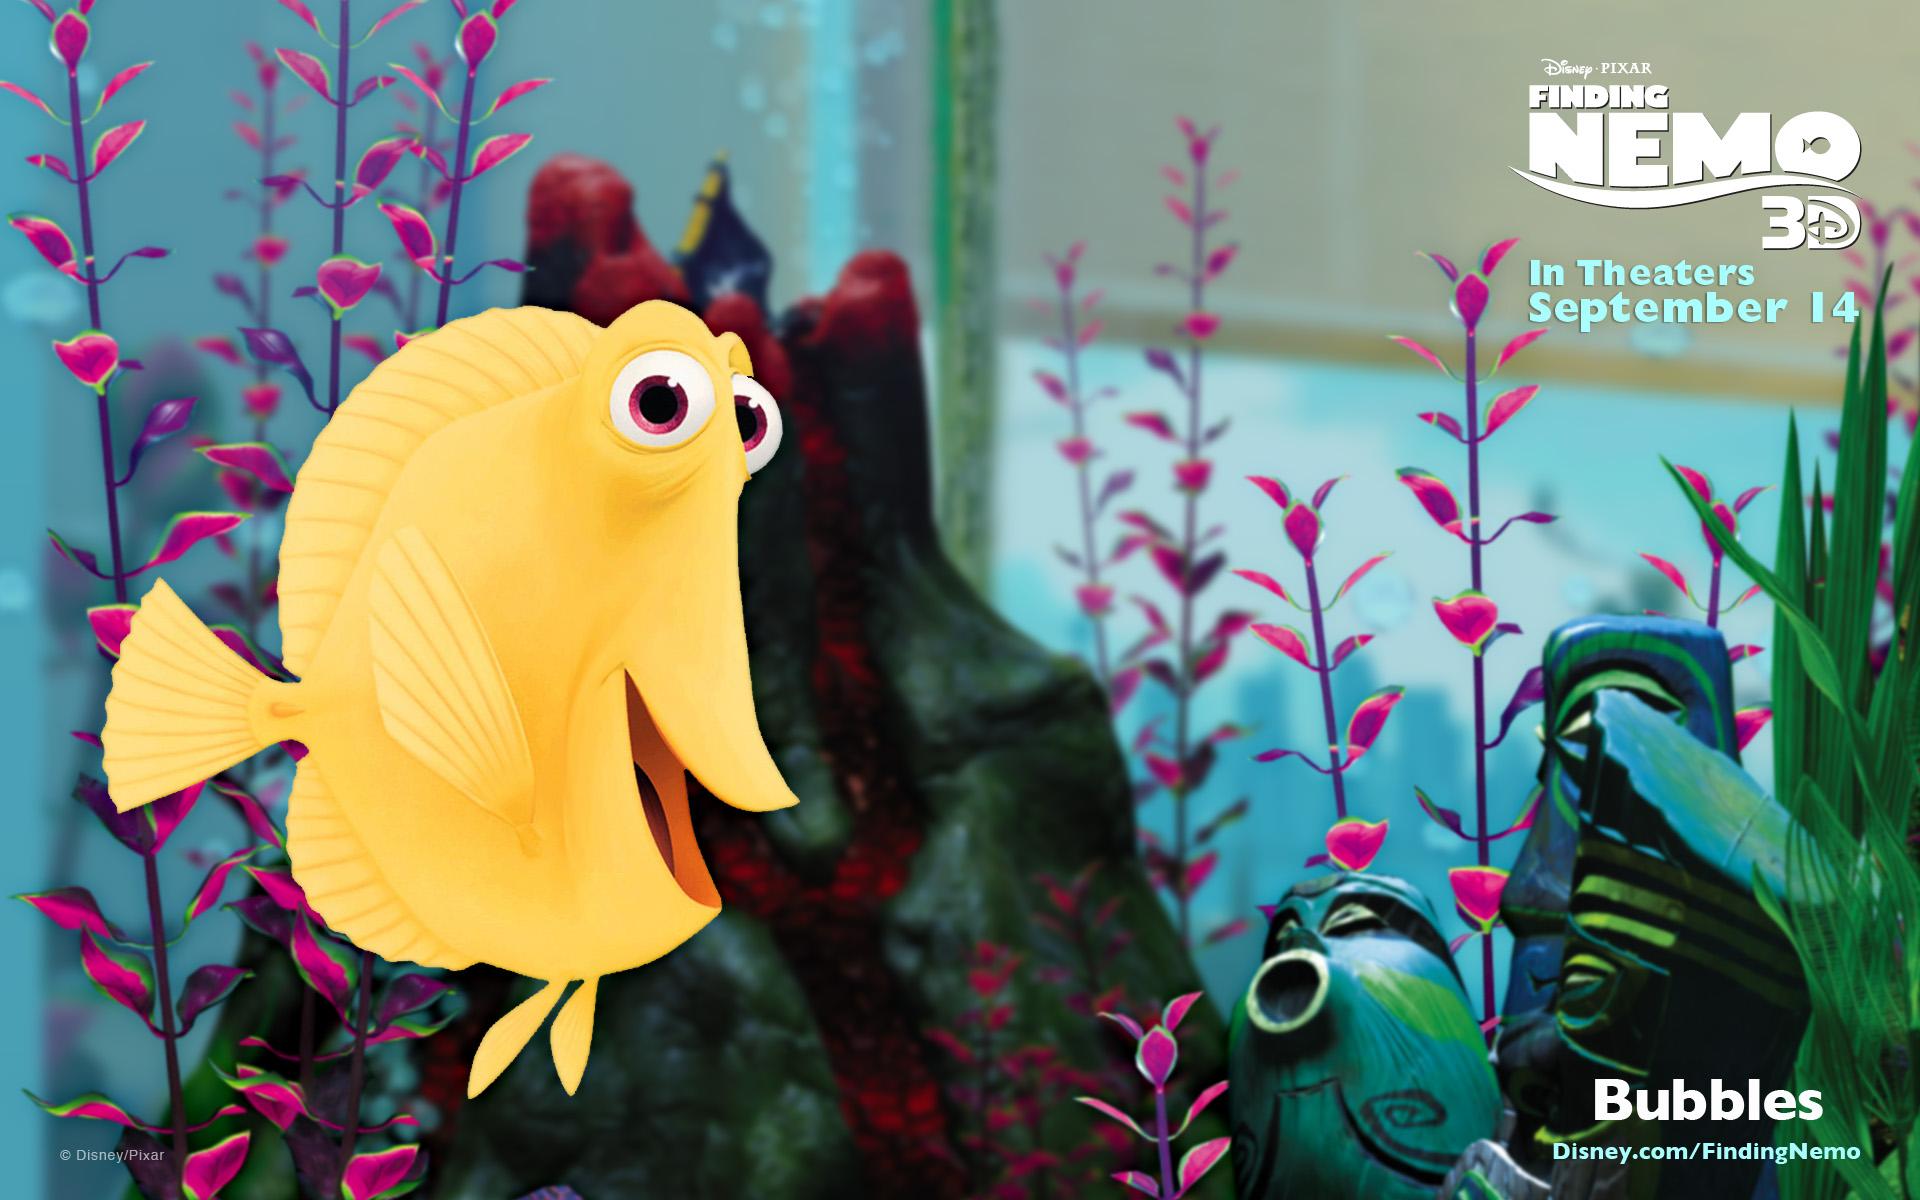 Fish aquarium quotes - Fish Aquarium Quotes